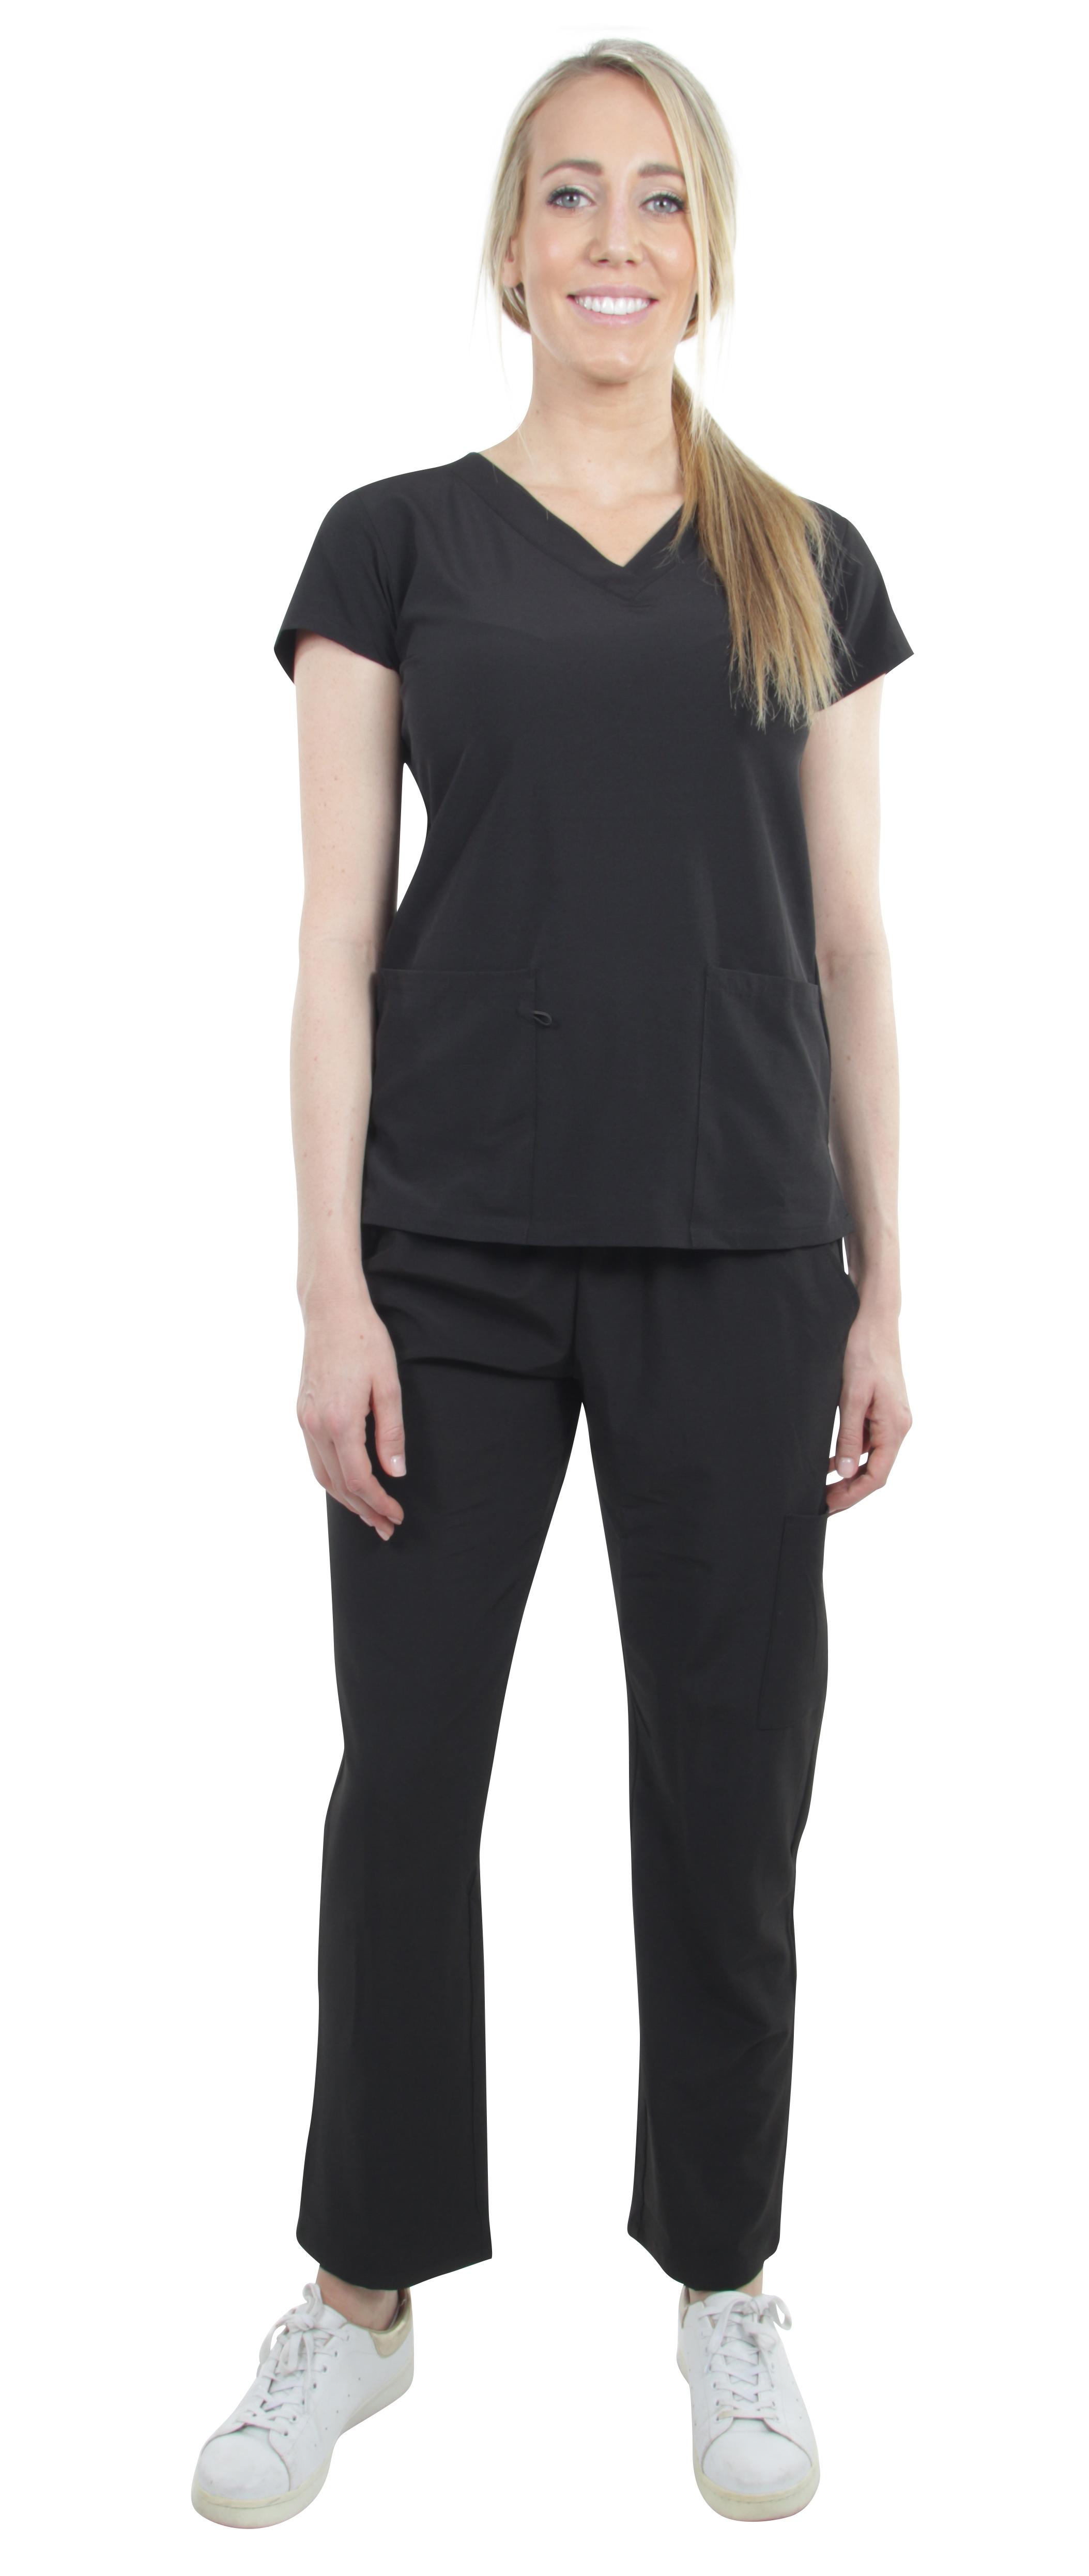 Unisex-Performance-Stretch-Medical-Uniform-Five-Pockets-V-Neck-Scrubs-Sets thumbnail 13